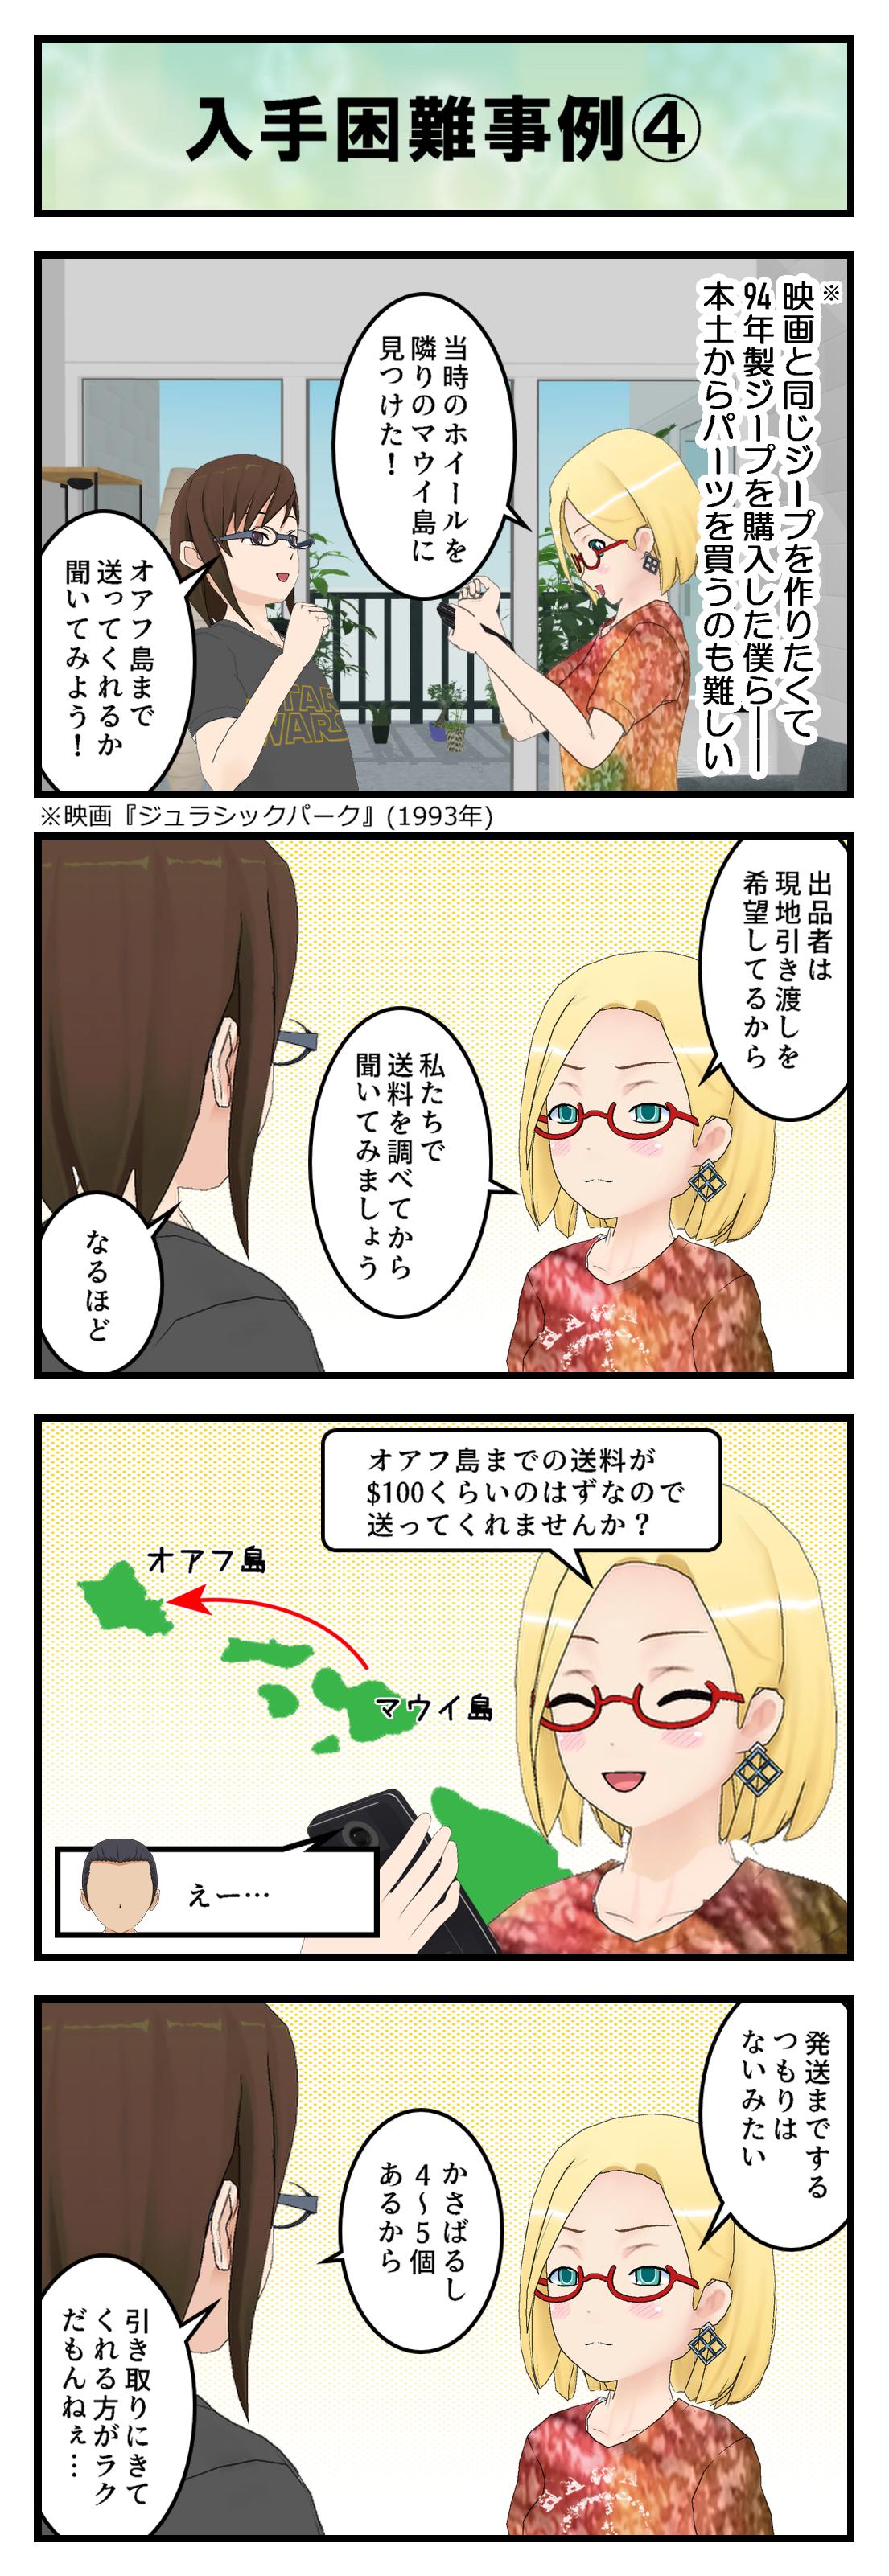 R725_入手困難事例4_001